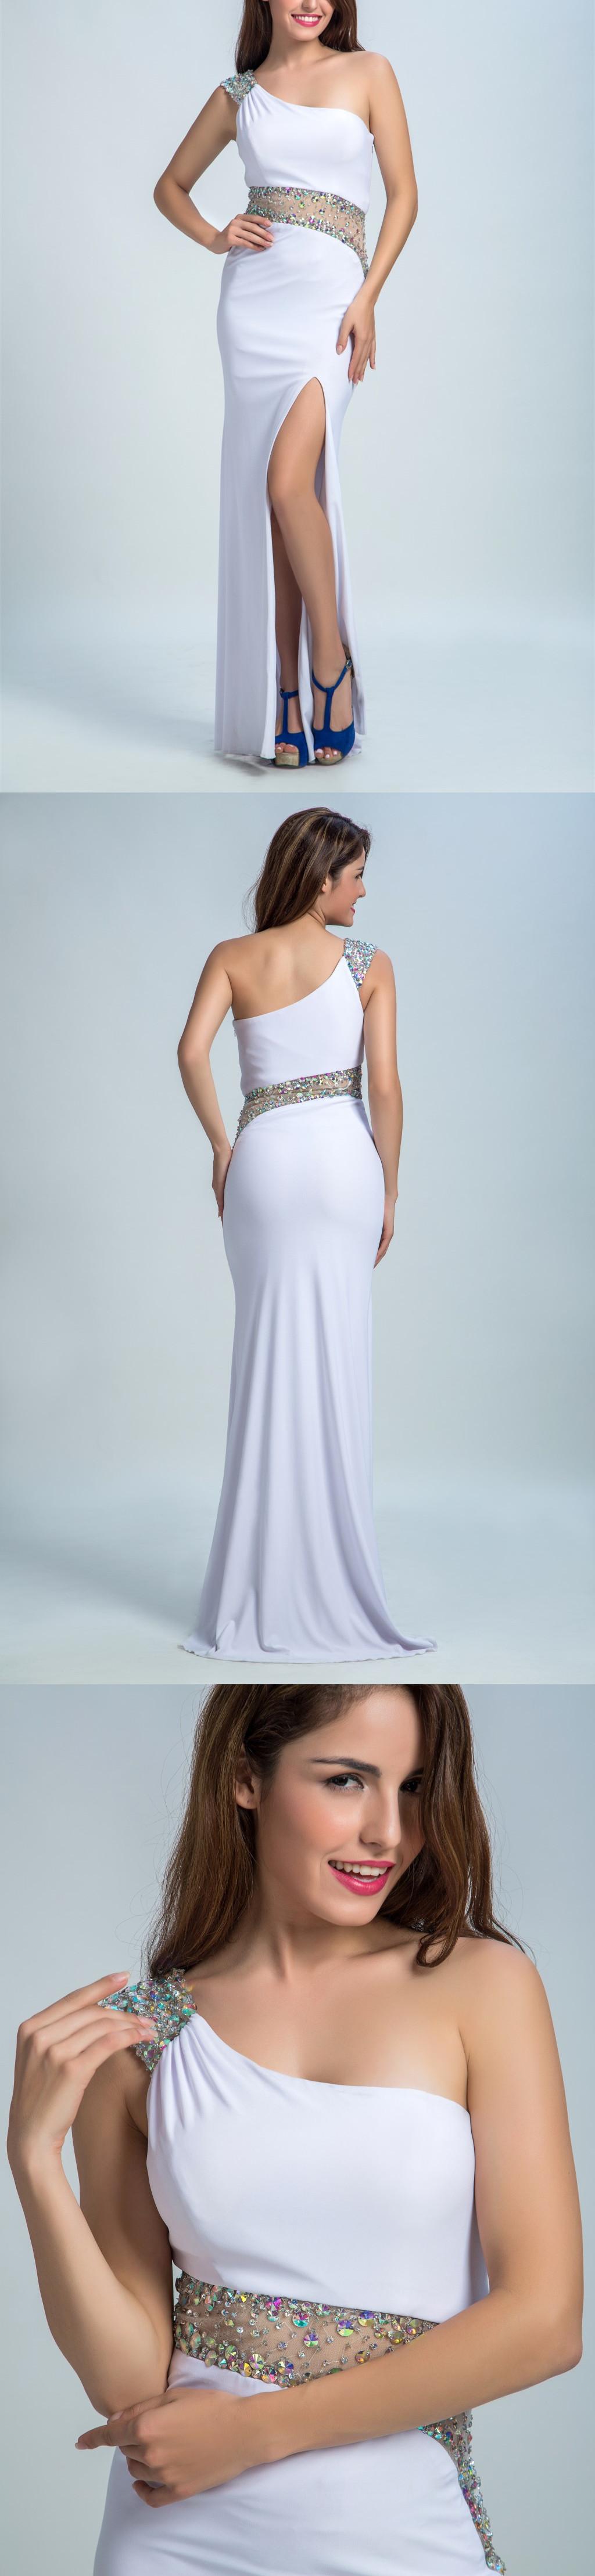 Trumpet/Mermaid Asymmetric Sweep Train Satin Sequined Prom Dresses ...